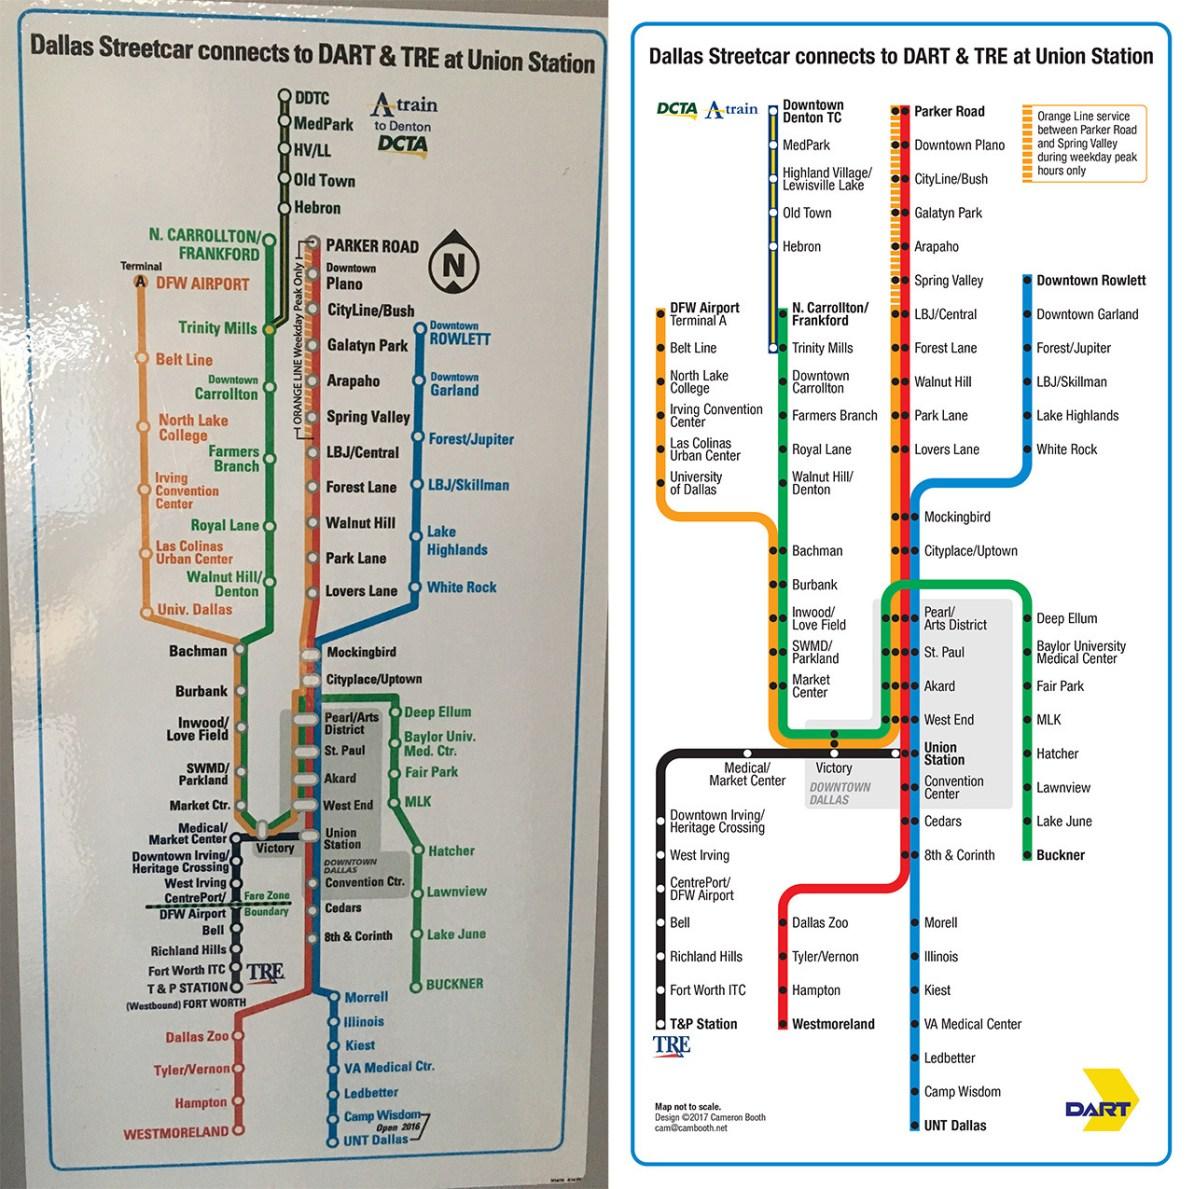 Transit Maps: Quick Project: Redesign of the Dallas ... on dallas state map, dallas arlington map, dallas tx map, dallas usa map, dallas co map, dallas location on map, dallas area map, dallas pa map, dallas ga, dallas wv map, dallas nc map, dallas or map, dallas vamc map, dallas california map, dallas texas map clip art, dallas florida map, veterans administration hospital temple texas map, dallas washington map, dallas eu map, dallas sd map,